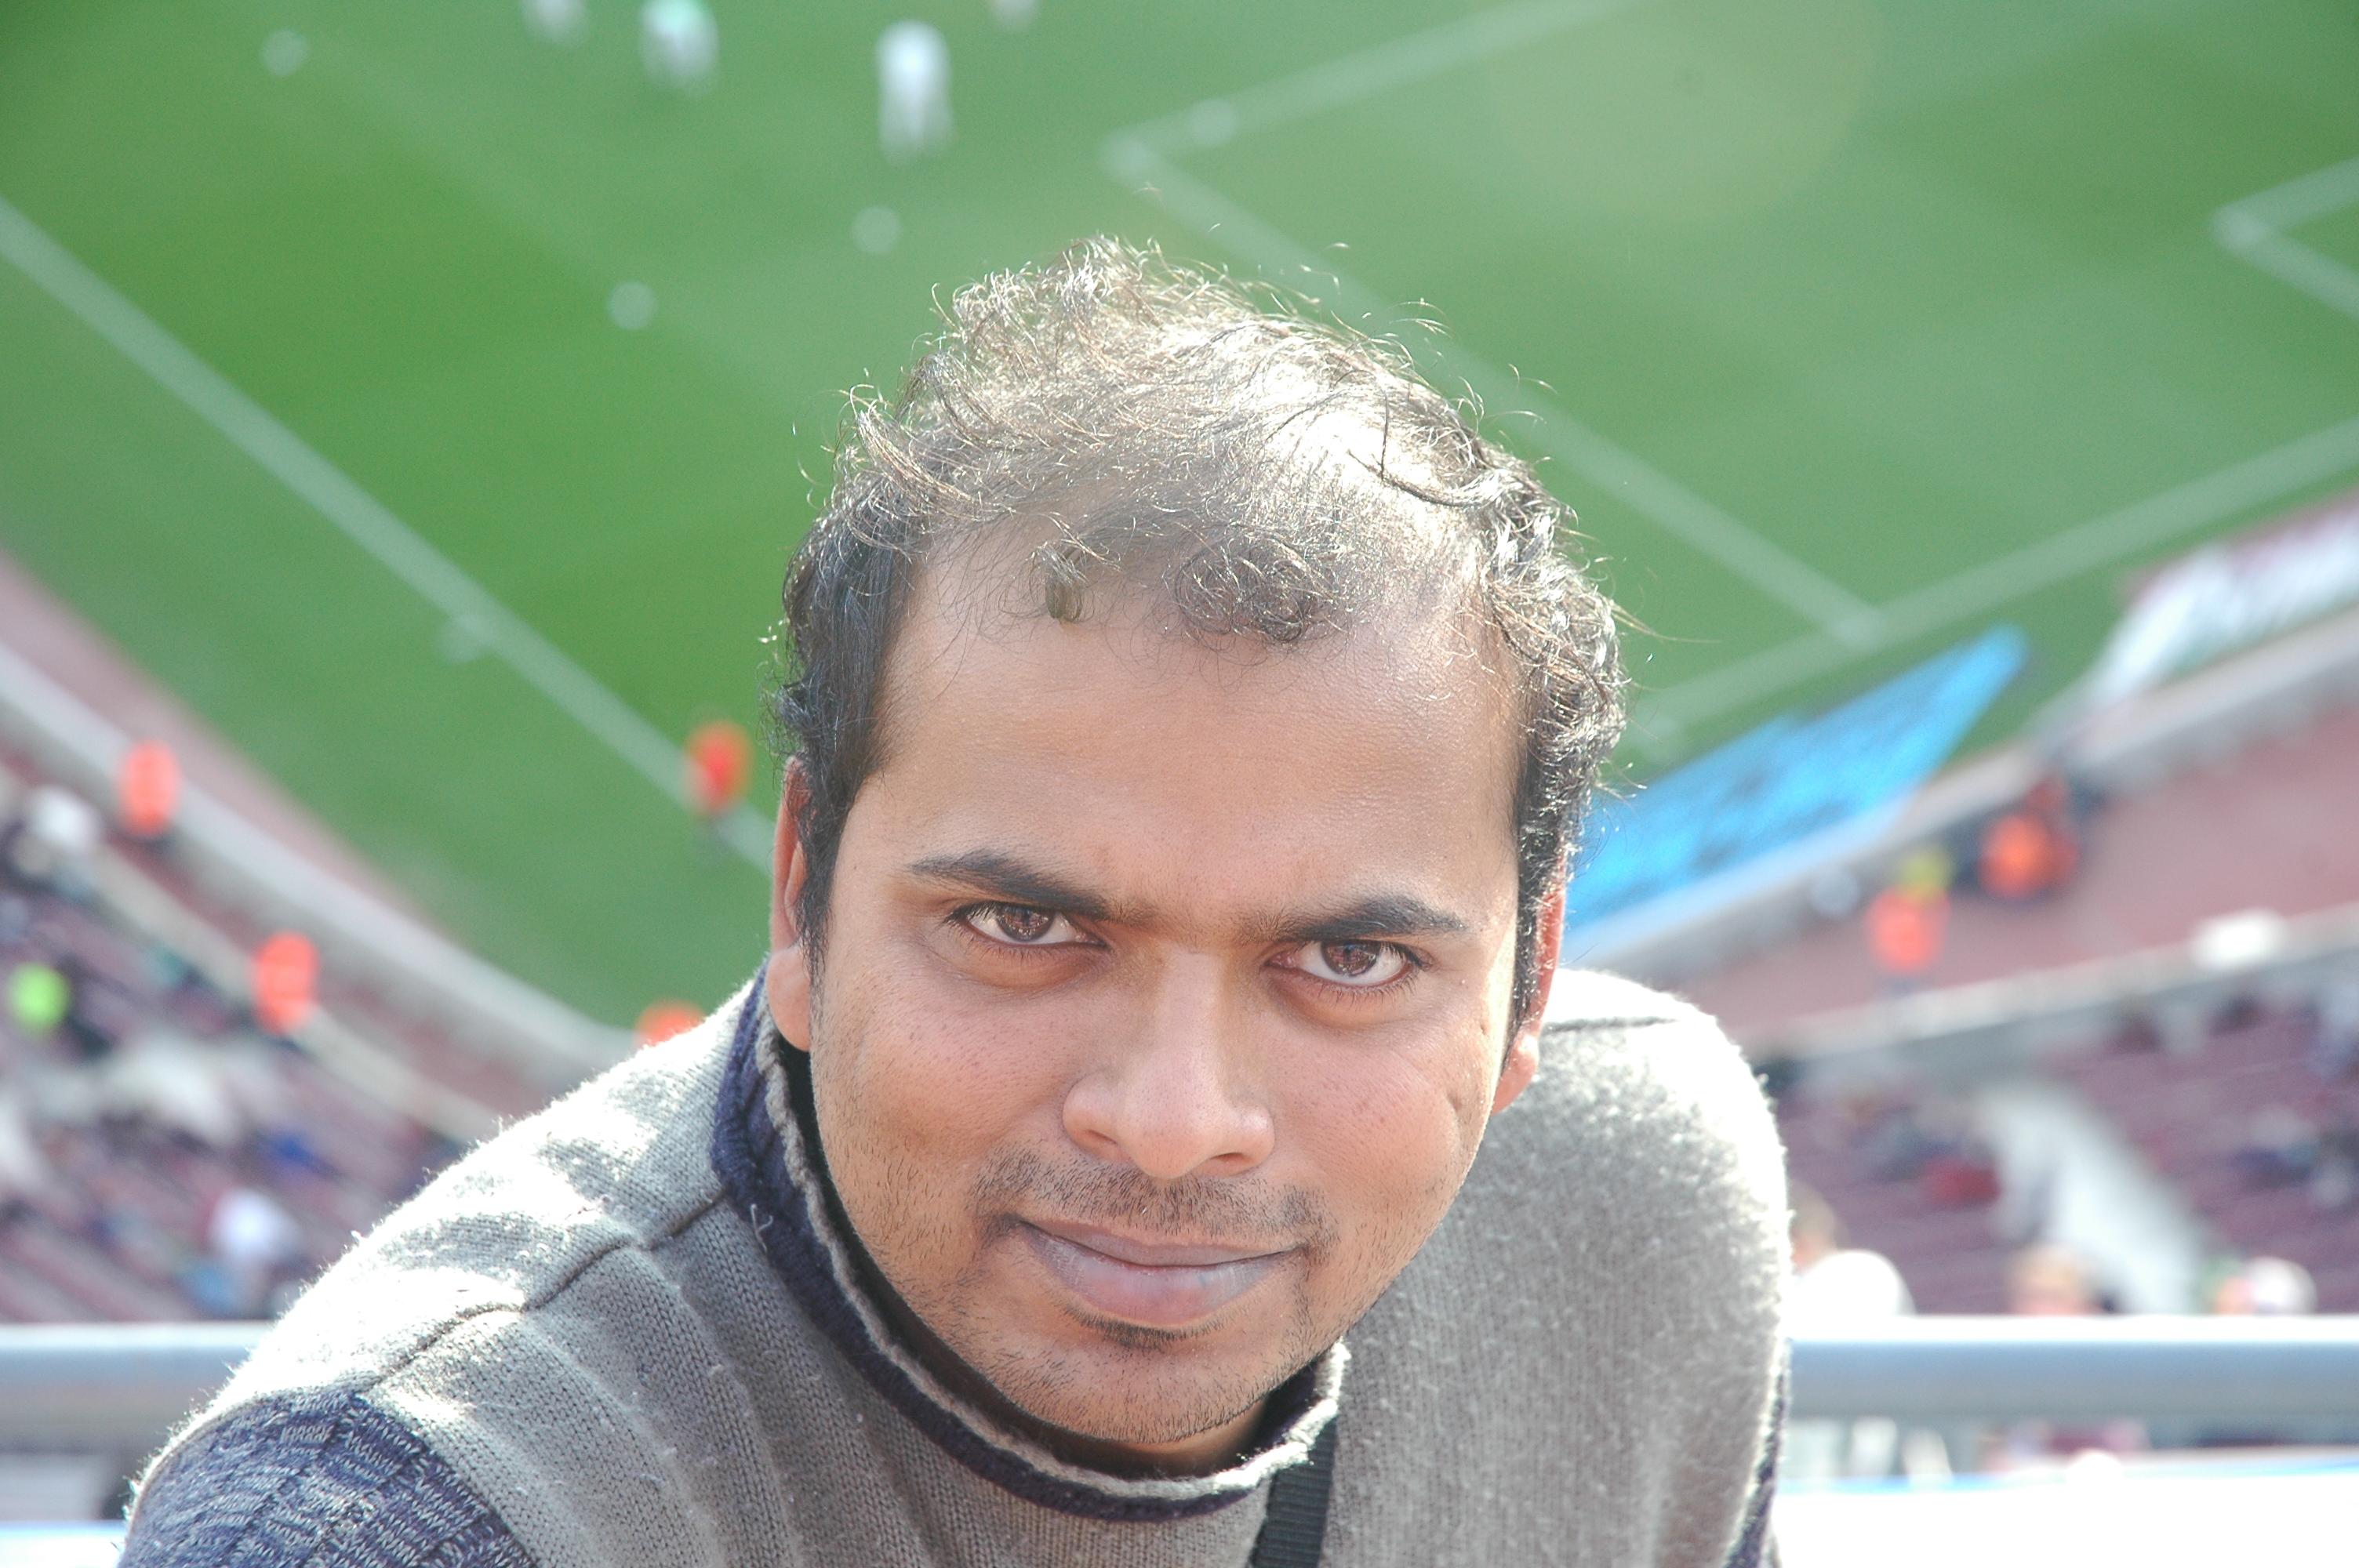 Deepak Thimiri - Doctor of Philosophy - Biomedical sciences - Subject Matter Expert from Kolabtree